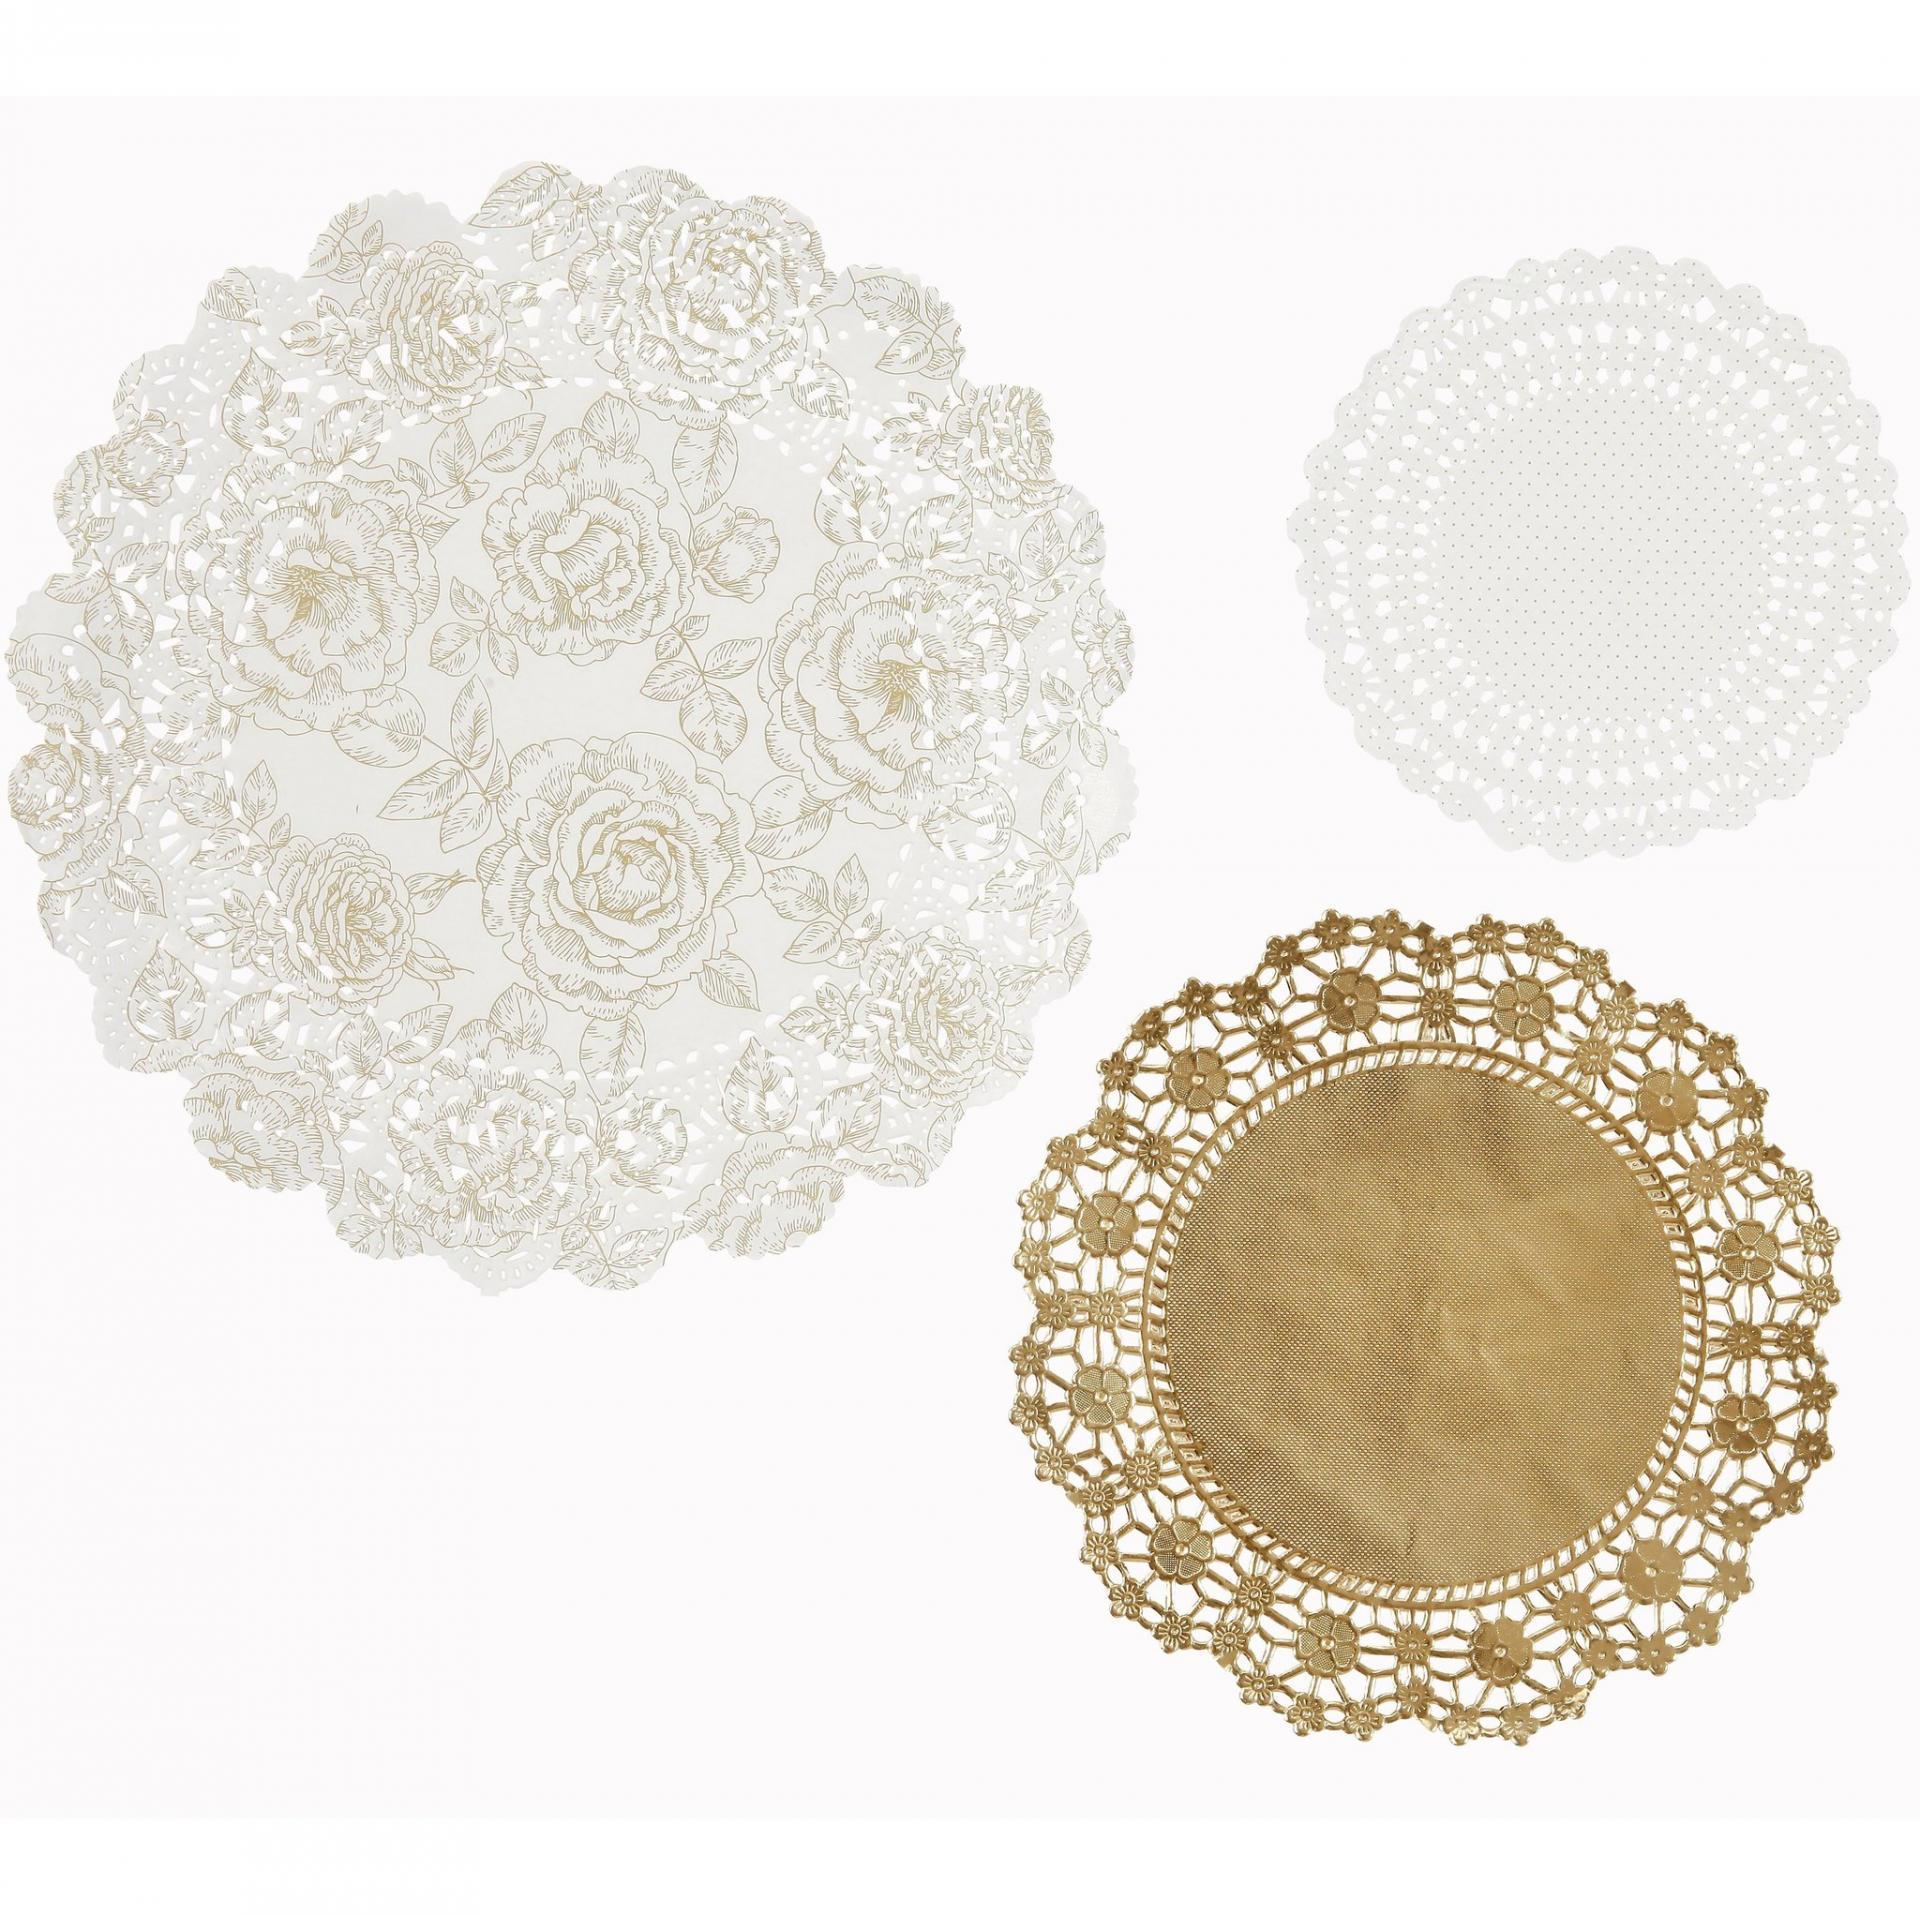 Talking Tables Sada papírových dekorací Gold Paper Doilies 24 ks, bílá barva, zlatá barva, papír